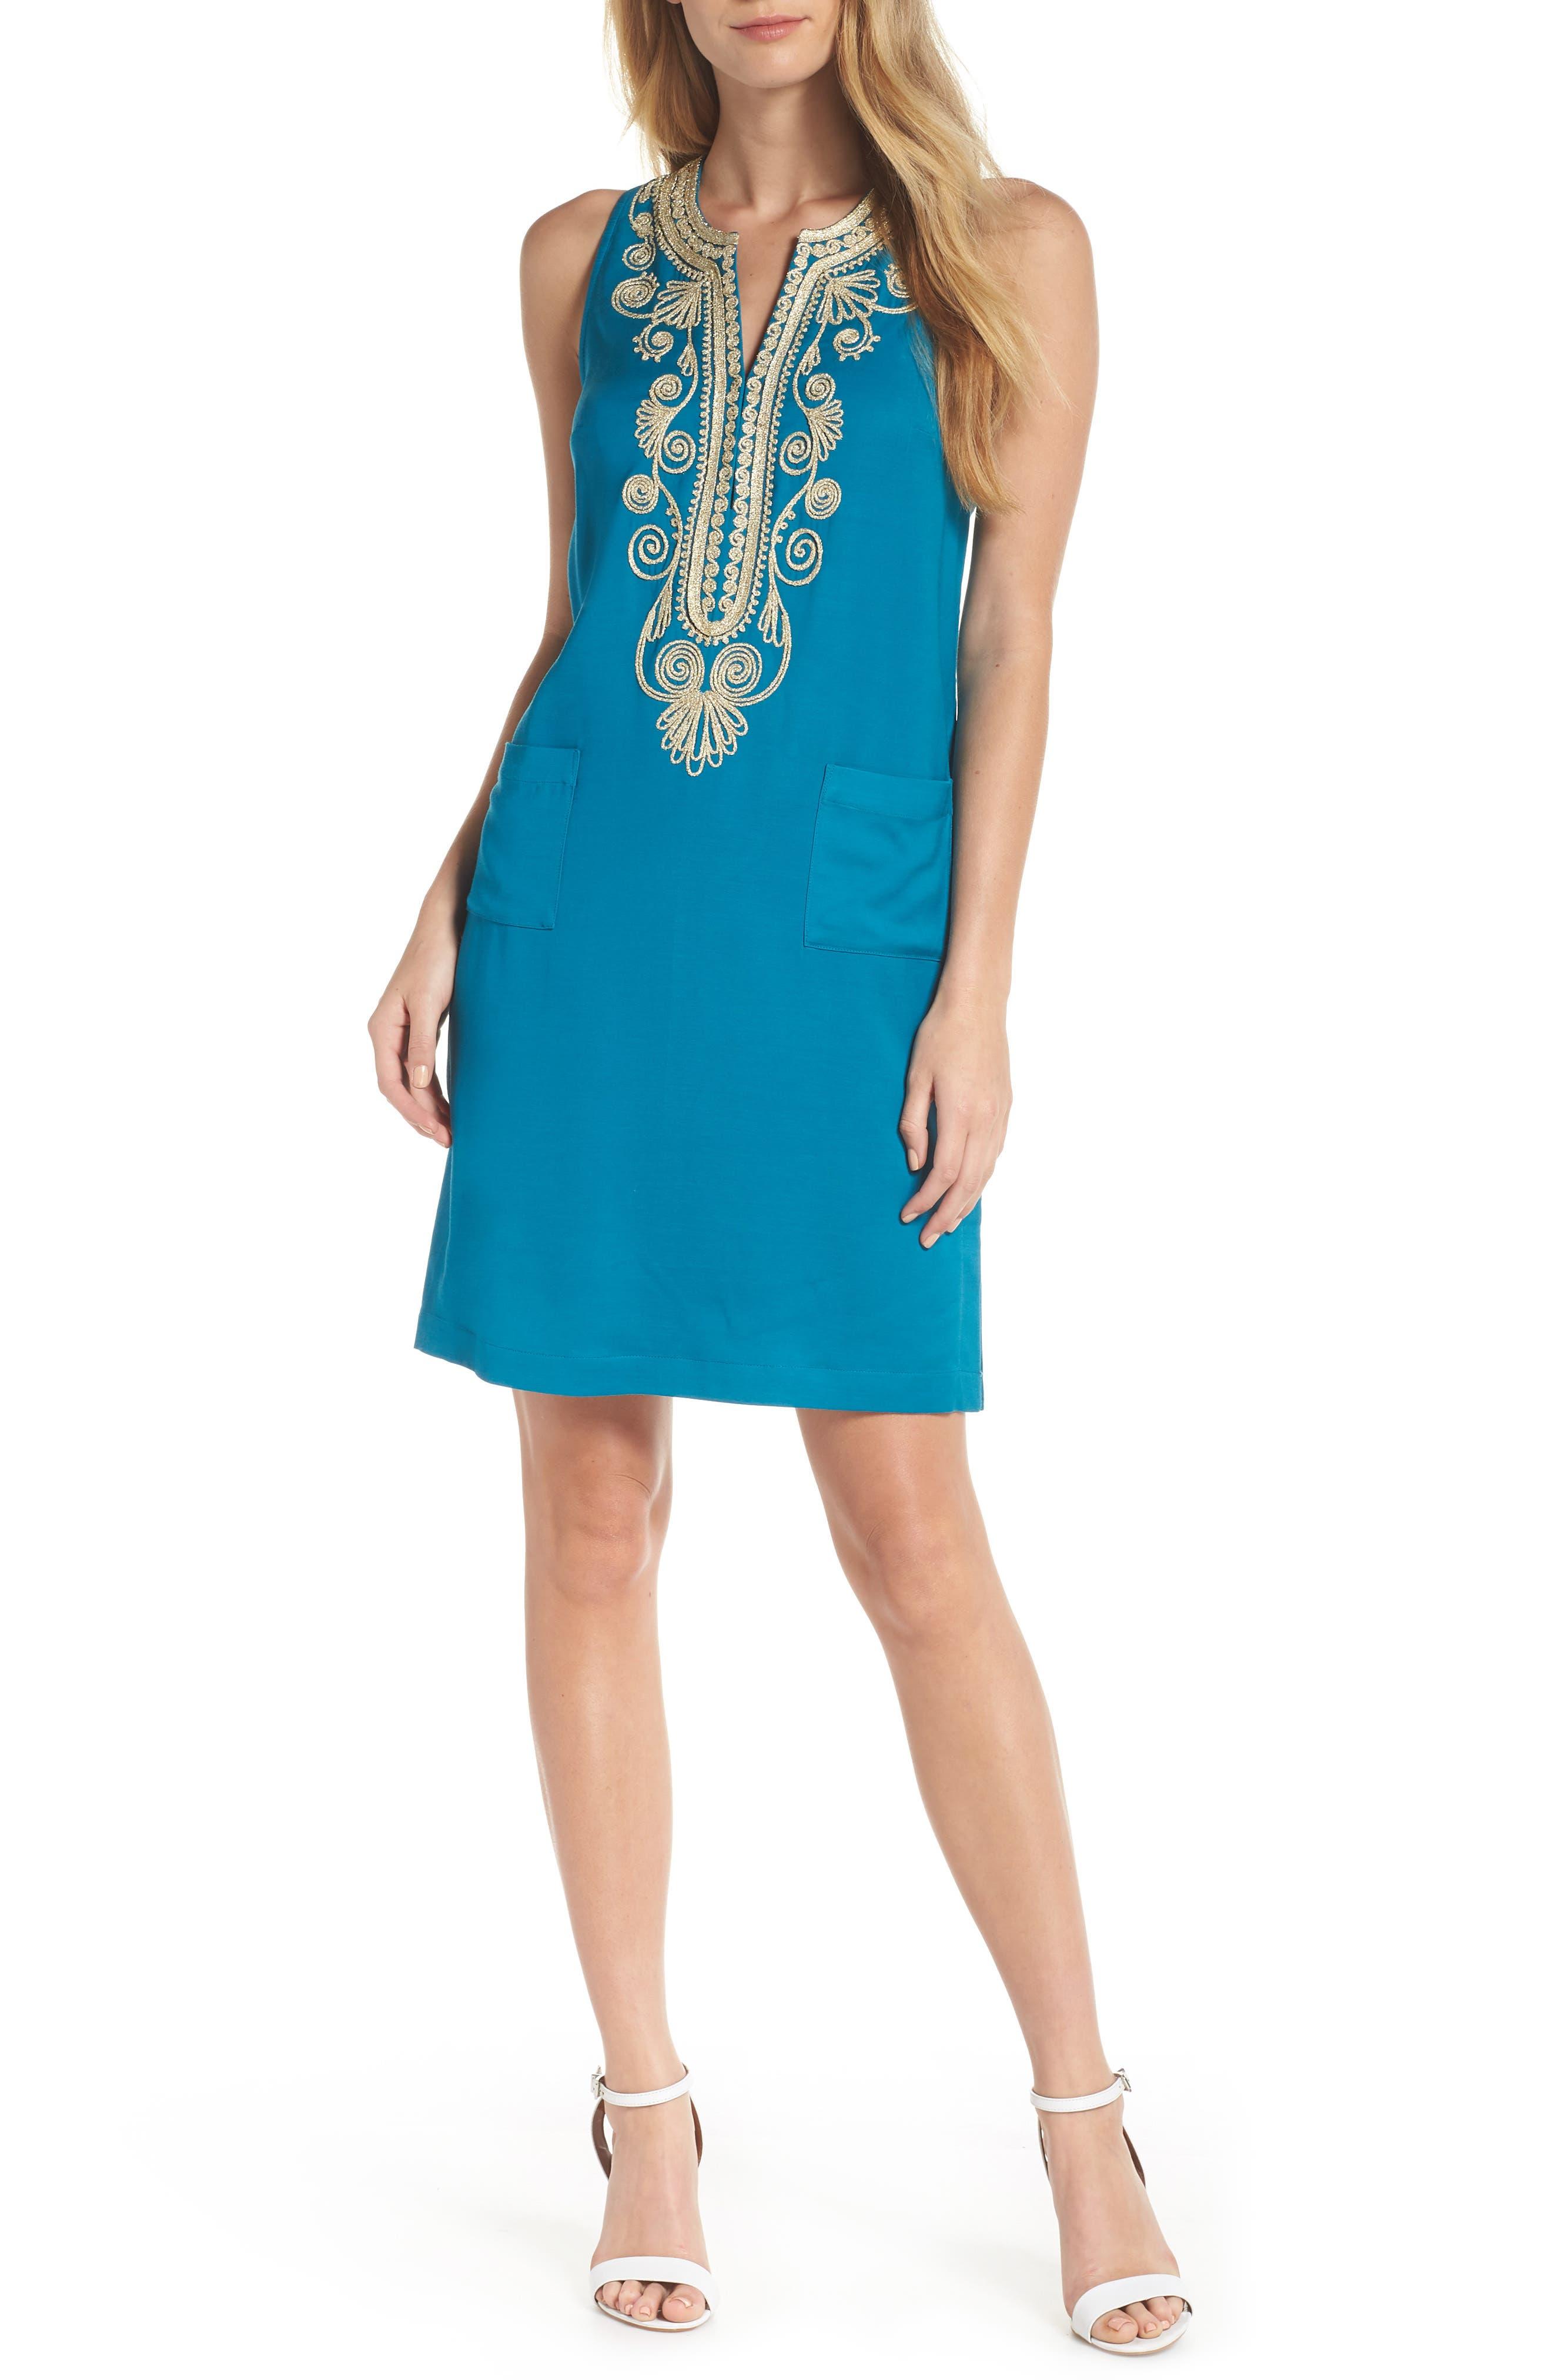 Lilly Pulitzer Carlotta Shift Dress